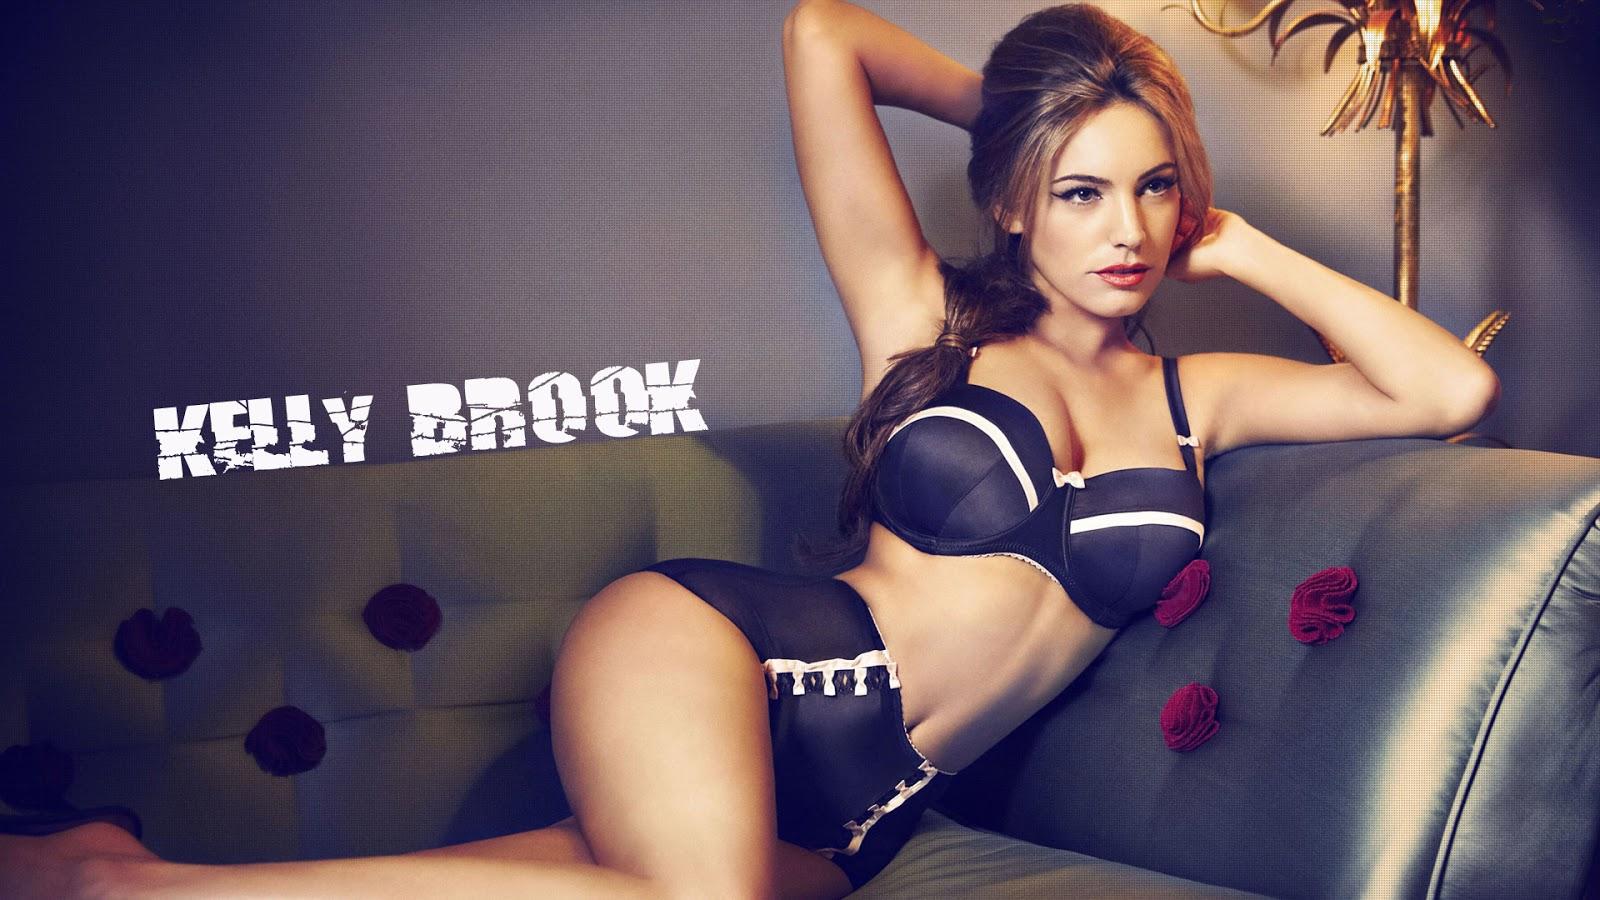 Black Kelly lingerie brook